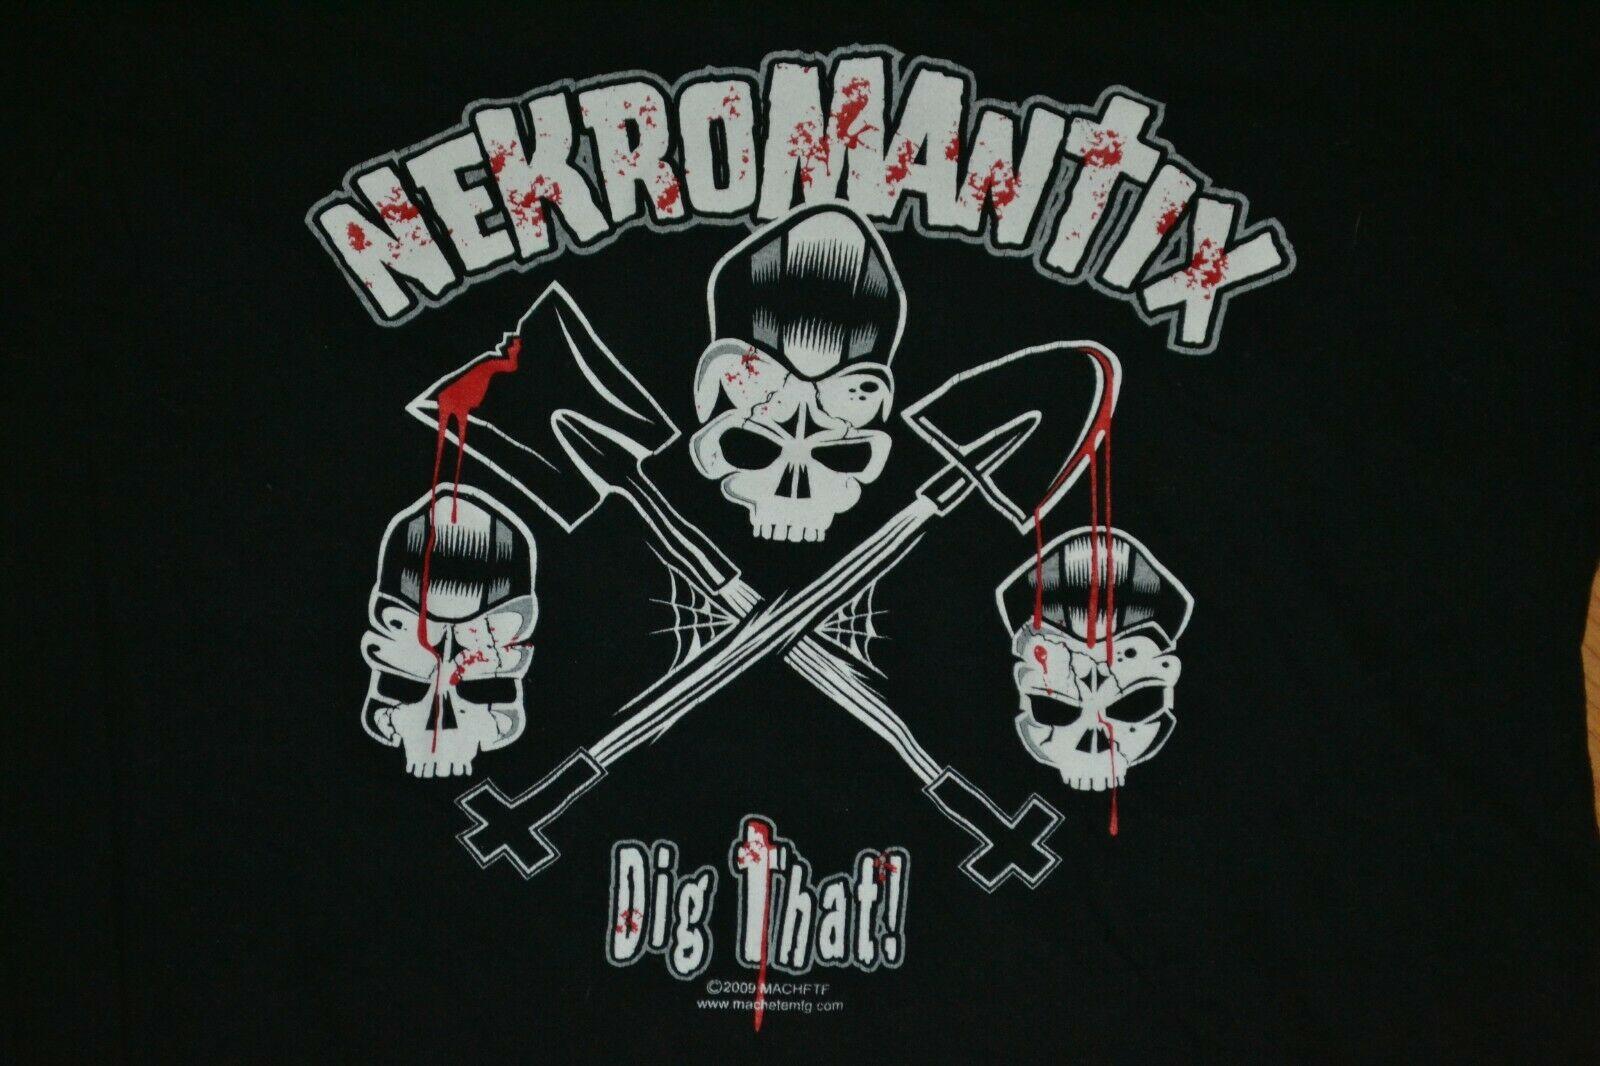 Mujer Nekromantix Dig esa banda concierto camiseta Jrs Xxl Nice Danish Psychobilly